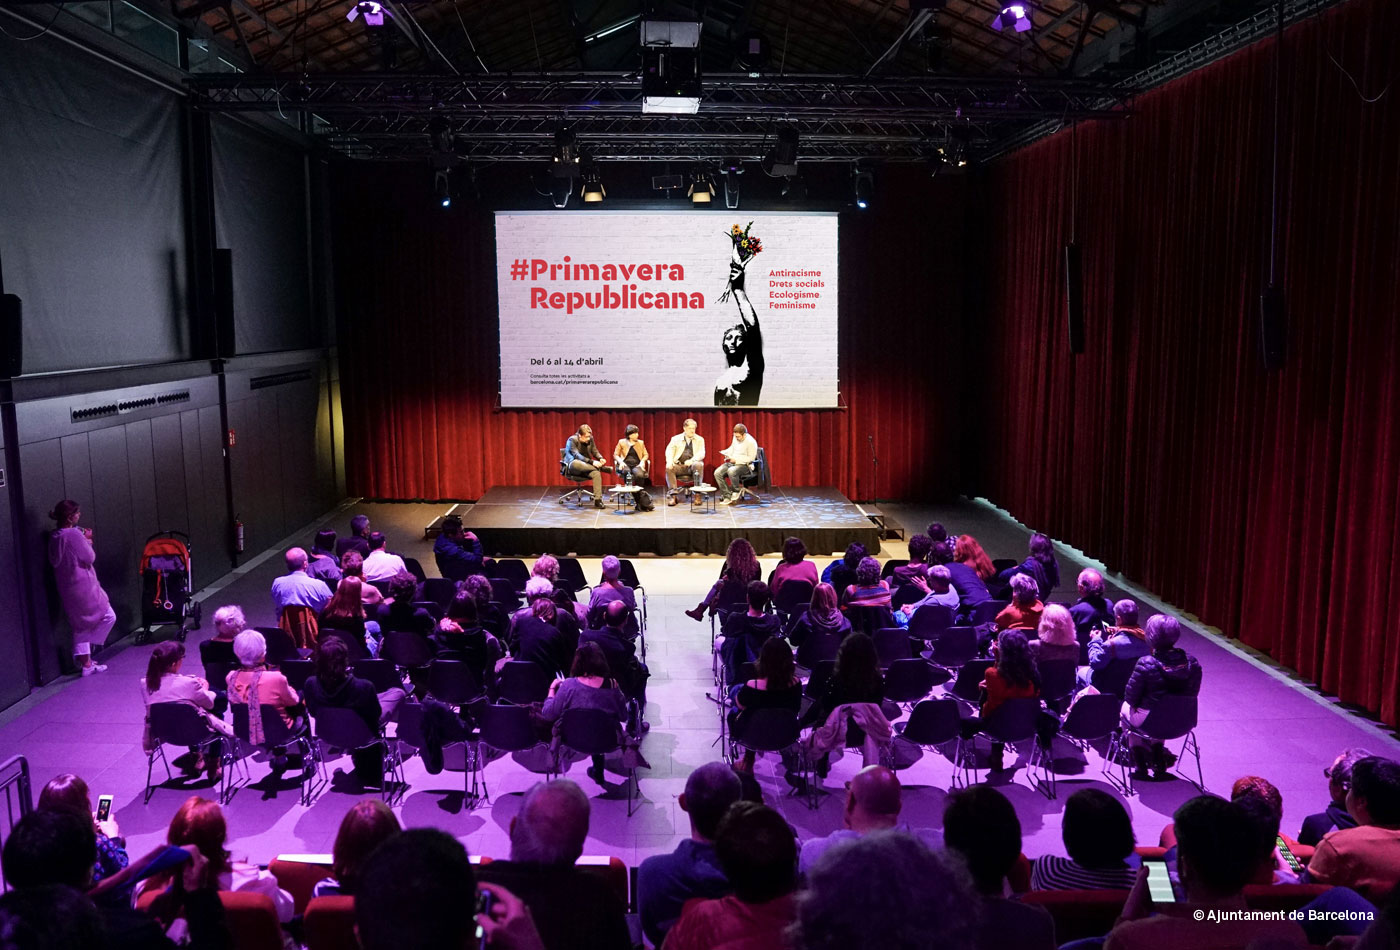 primavera-republicana-disseny-grafic-identitat-ajuntament-barcelona-femenisme-creartiva